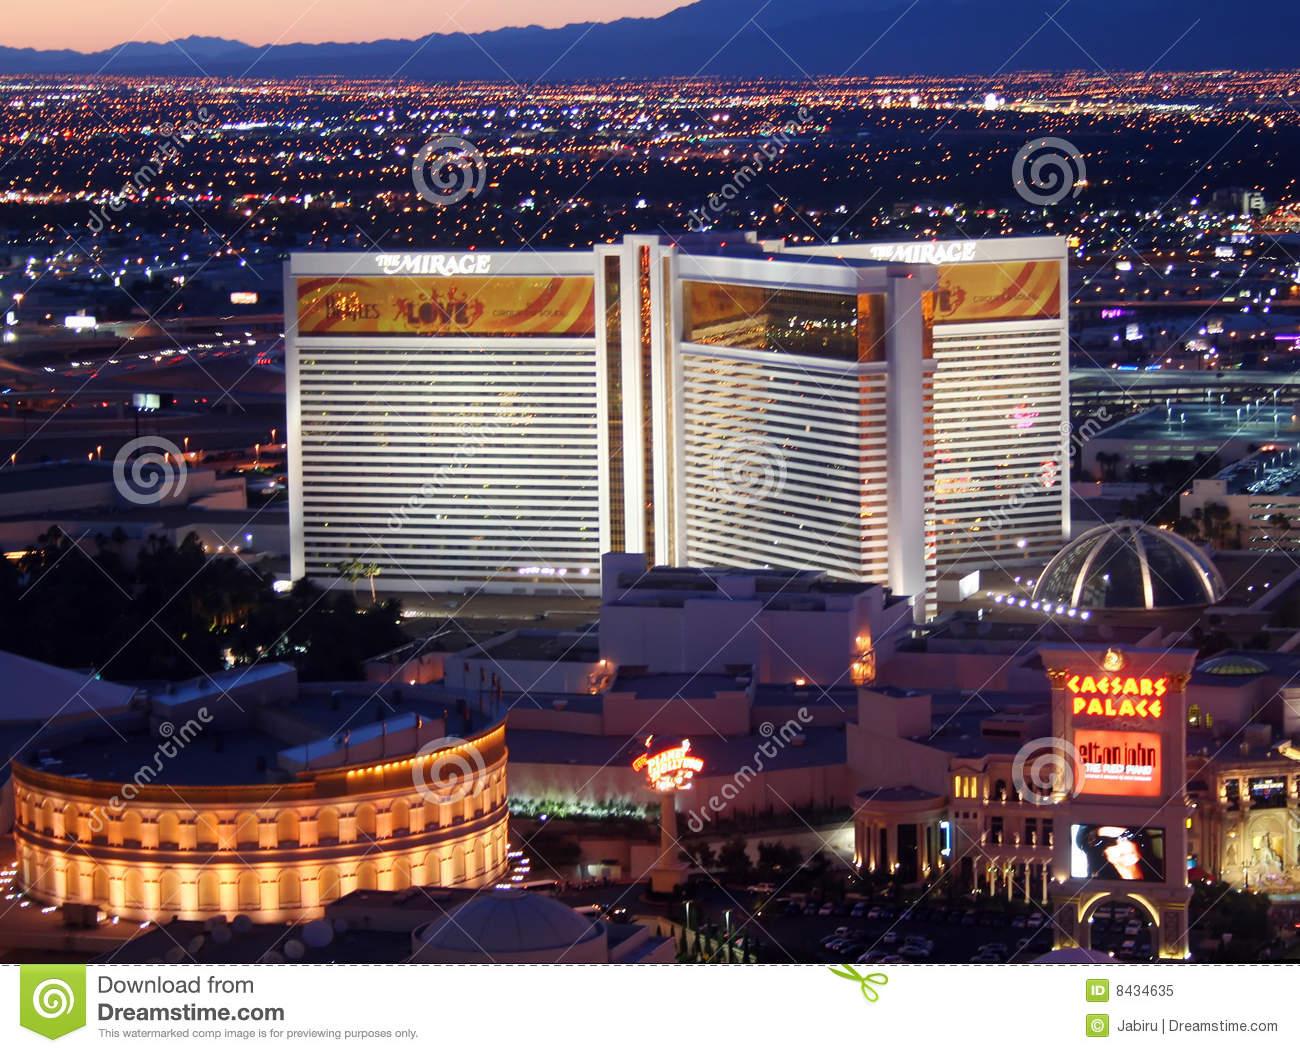 Mirage Casino Las Vegas Stock Photos, Images, & Pictures.